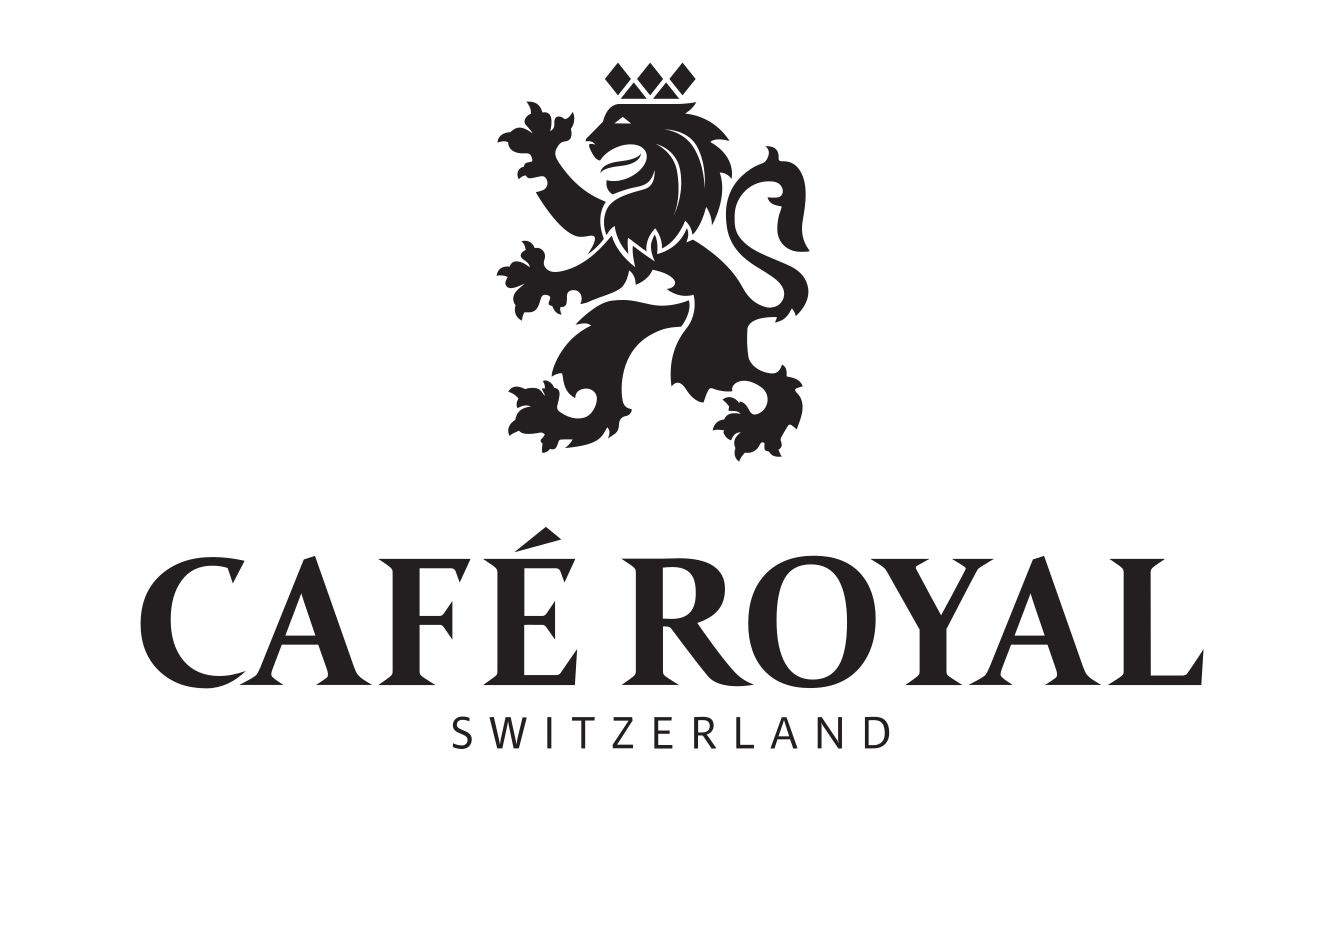 Café Royal – Bahnhofsampling